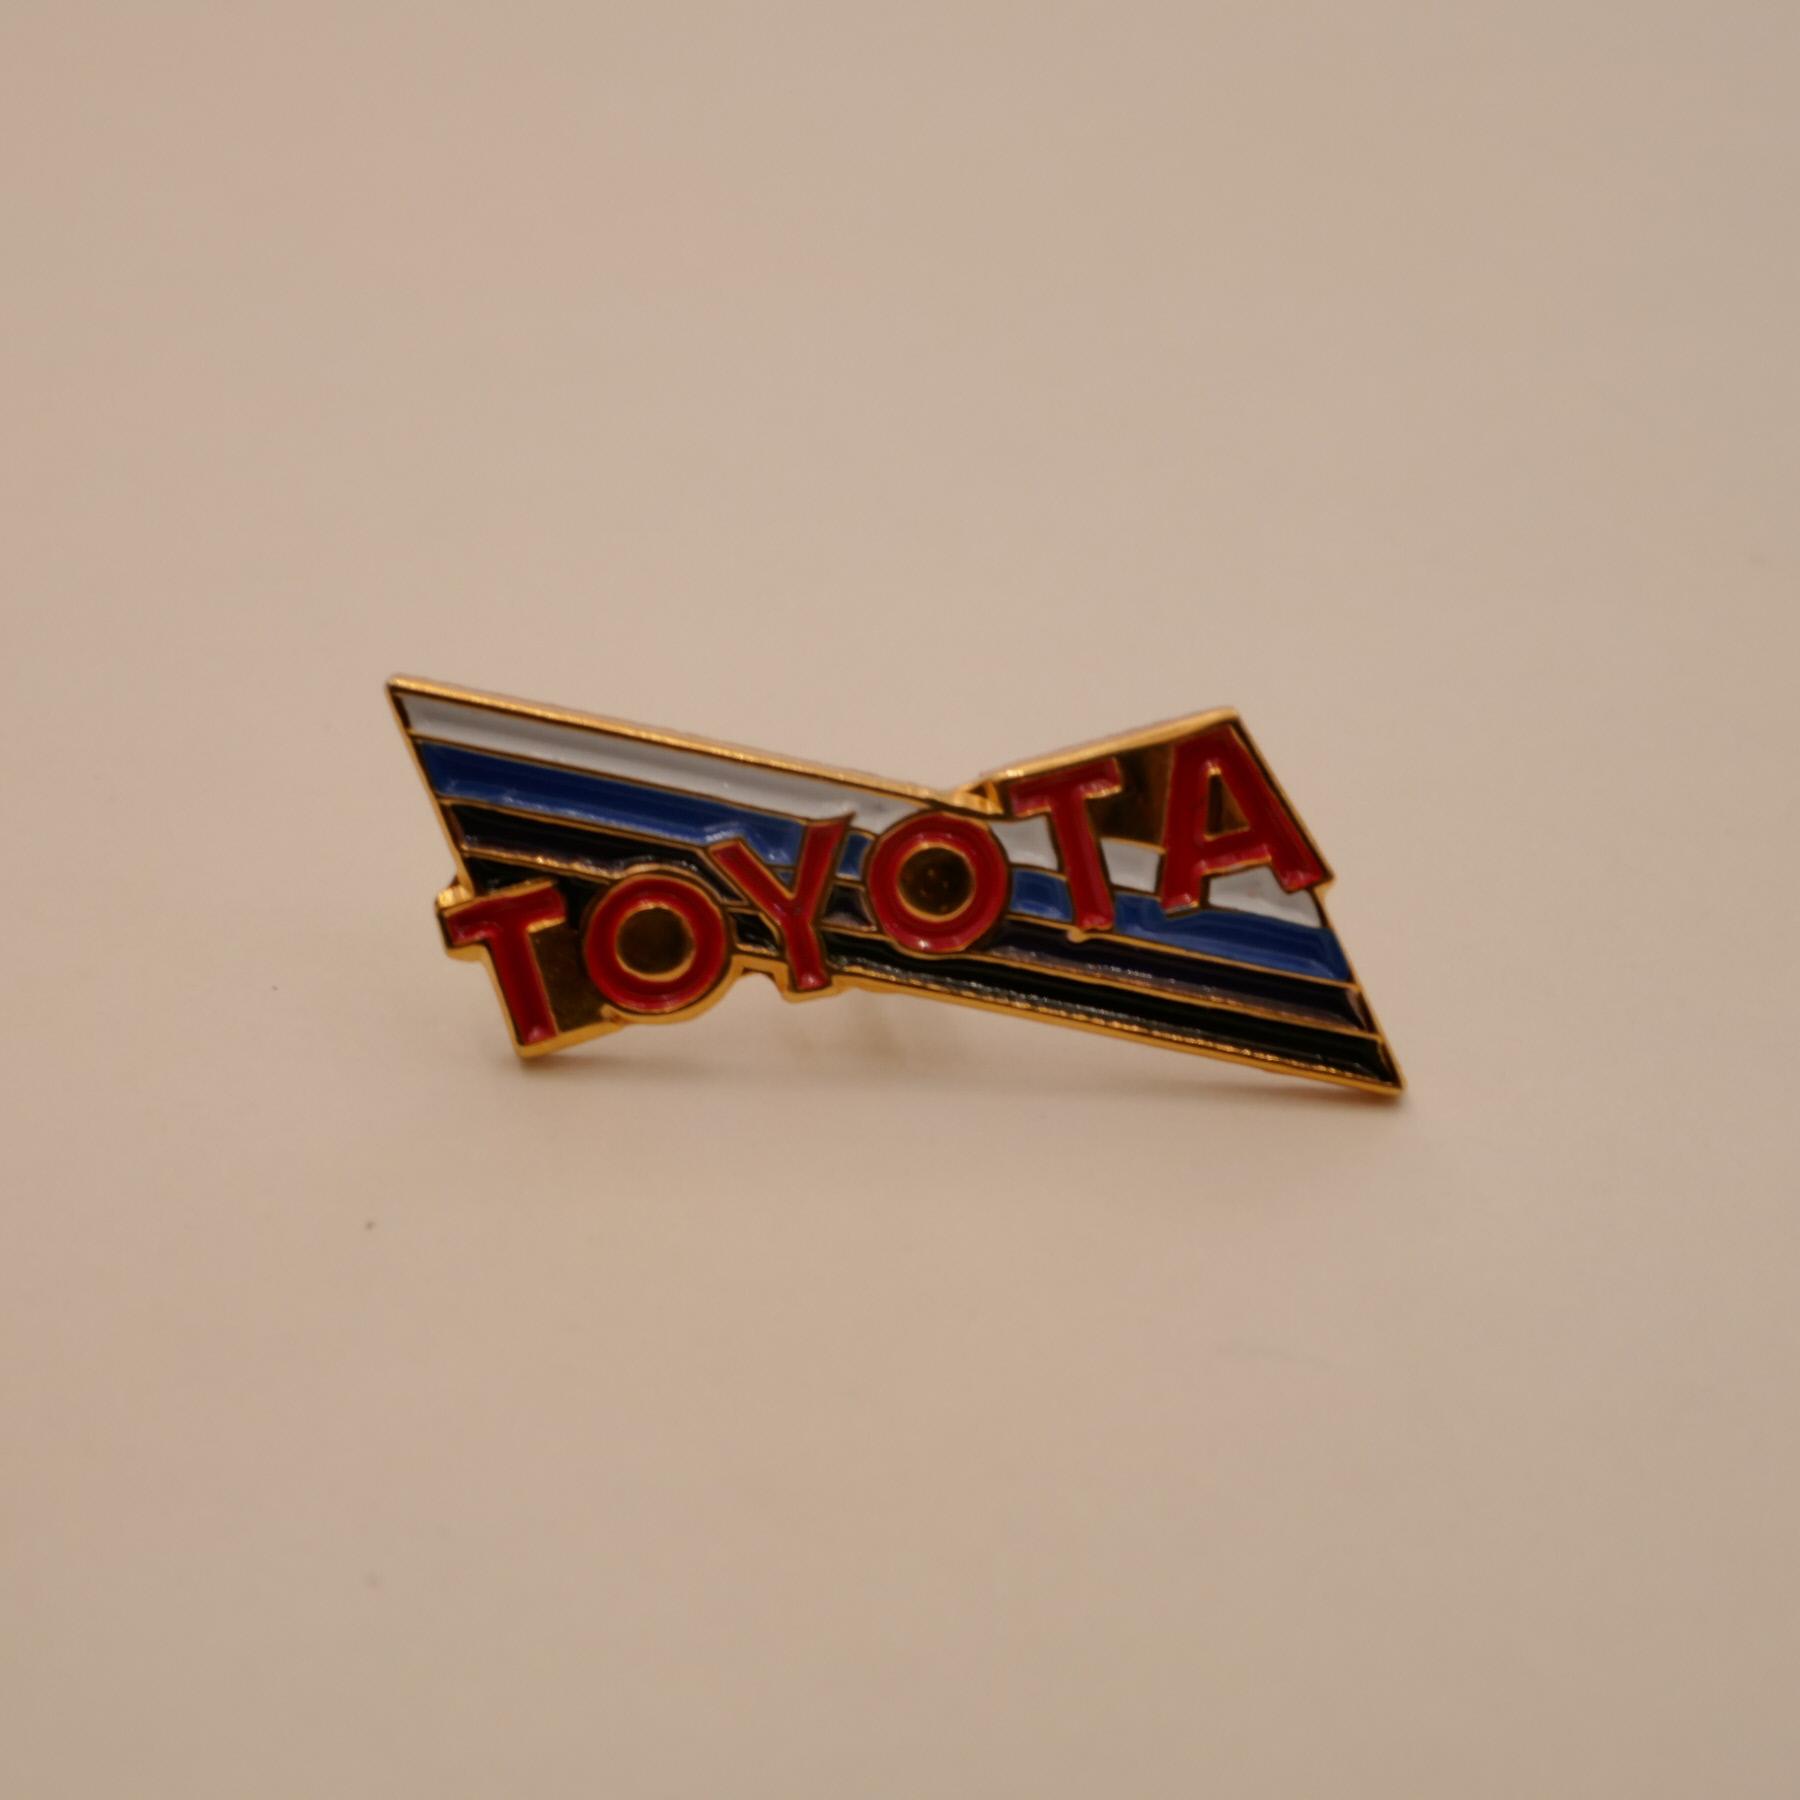 TOYOTA pins